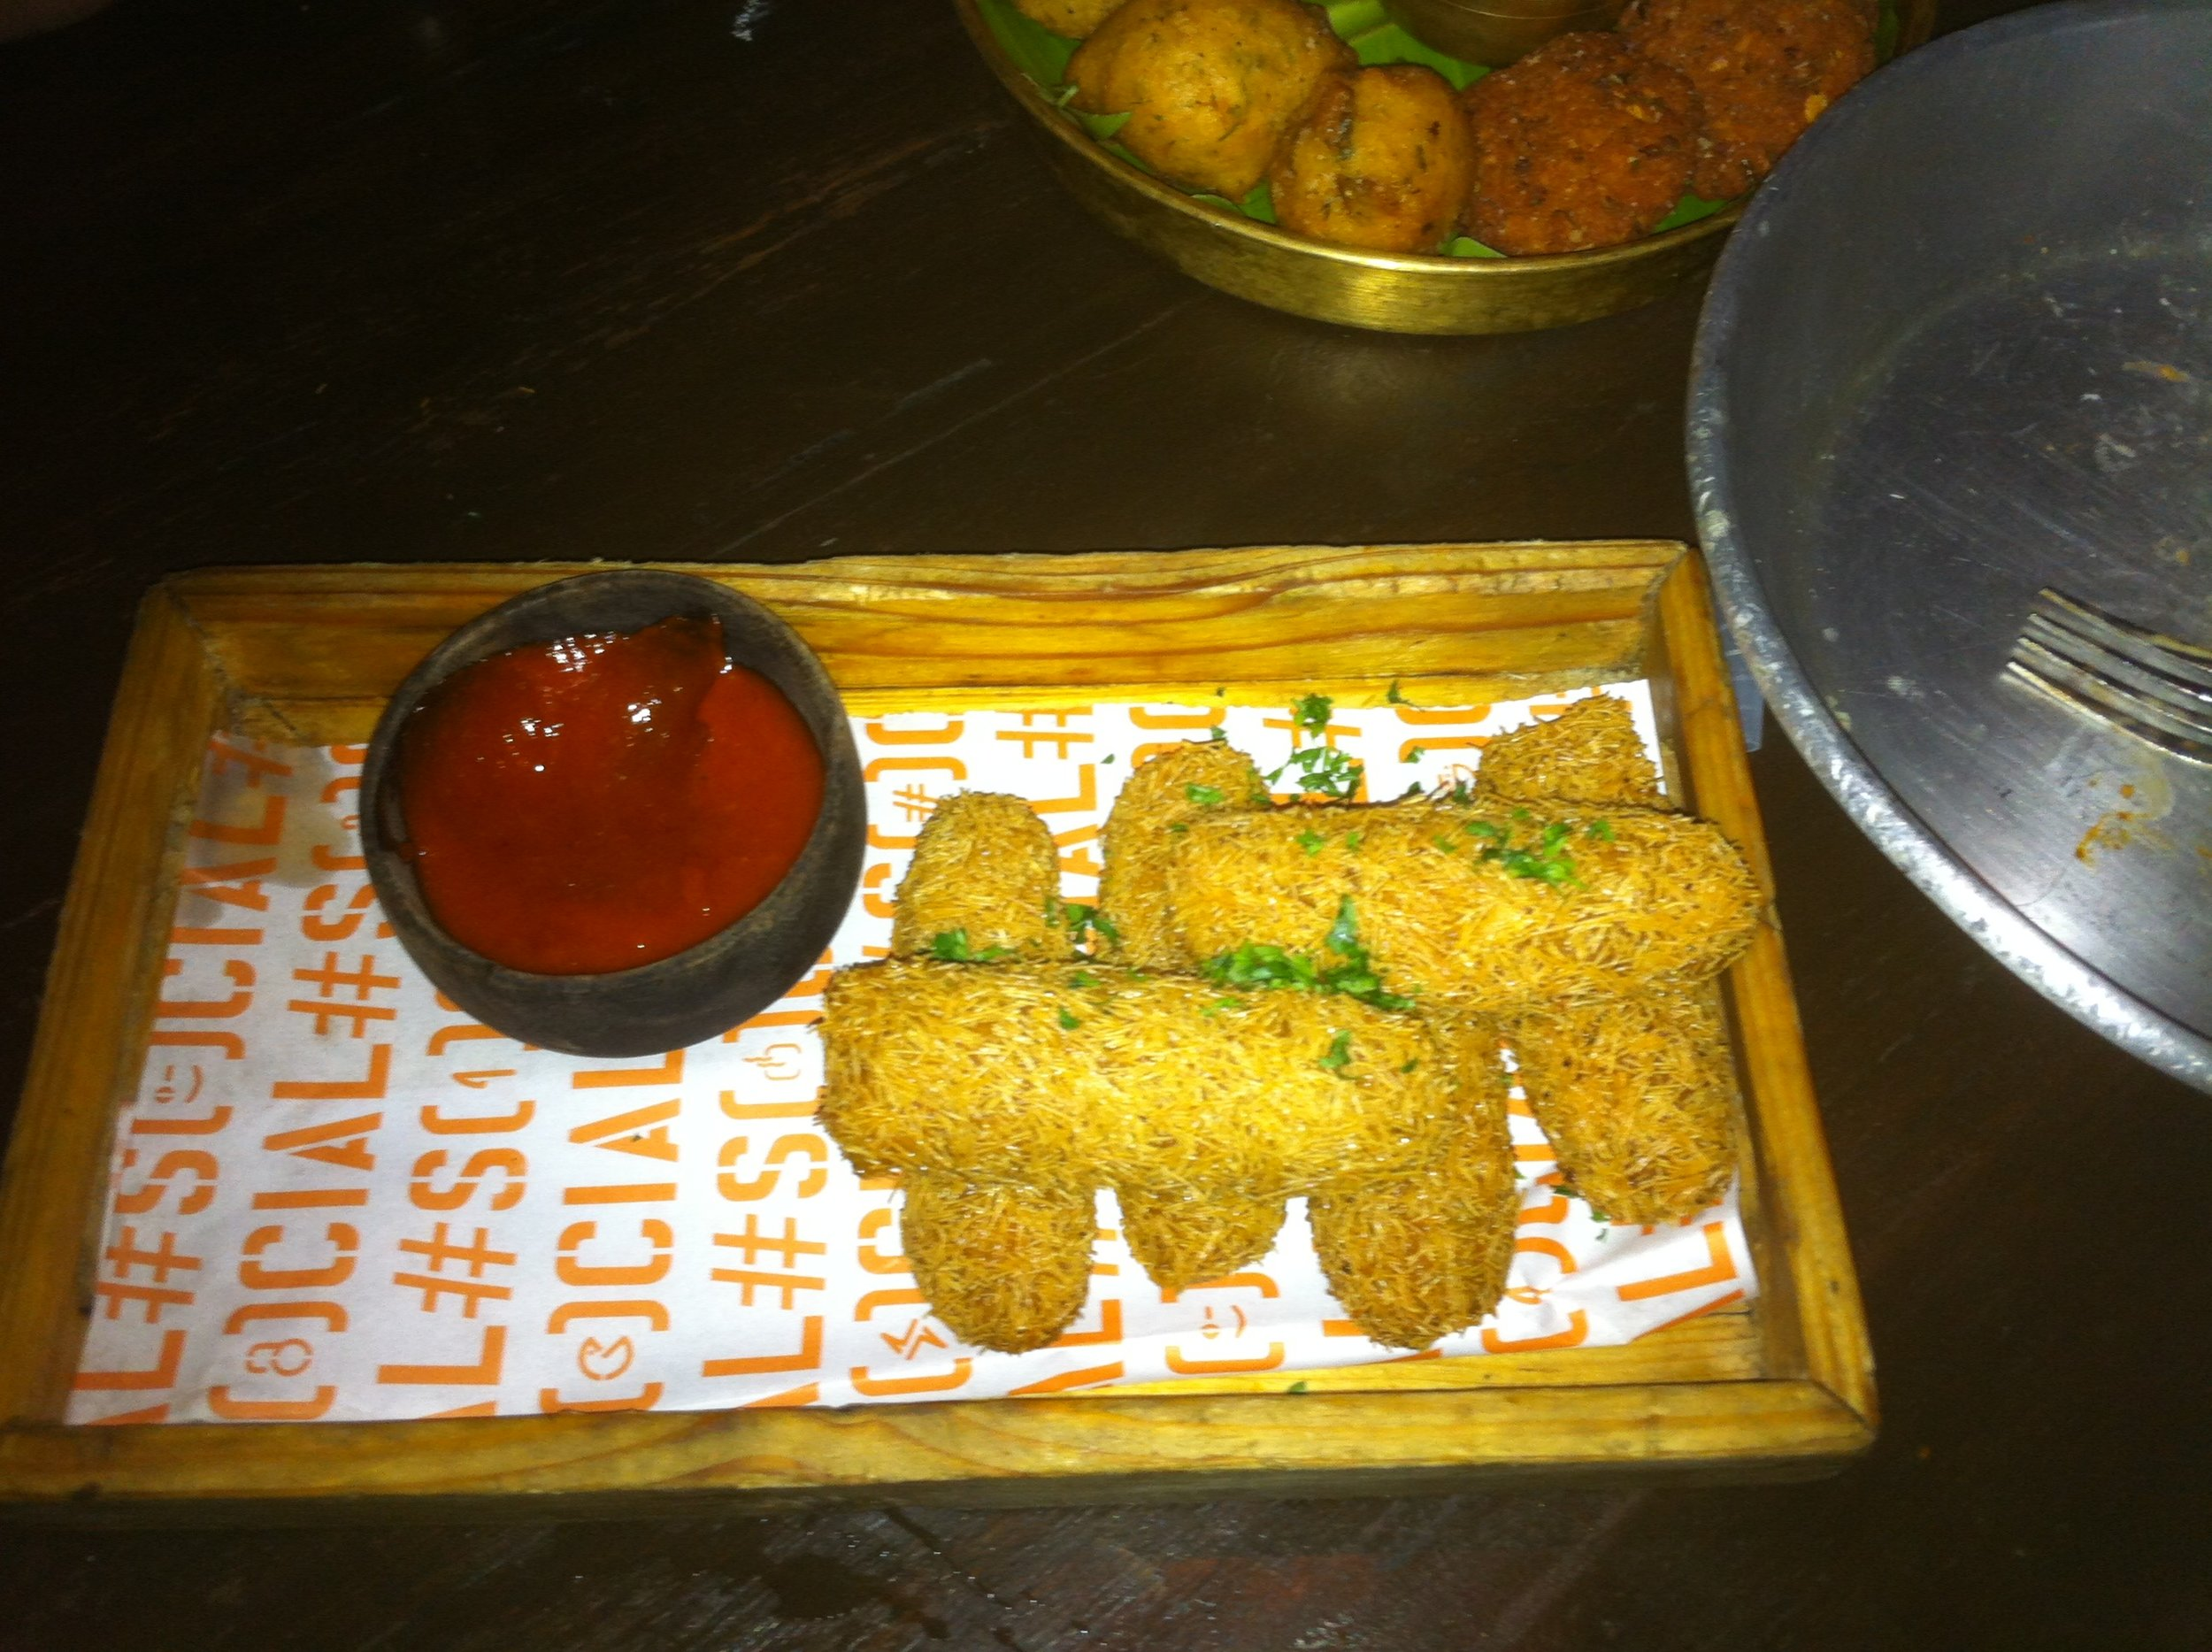 Croquettish | Social | Phoenix Market city | Bangalore | PritishSocial | Food Blogger